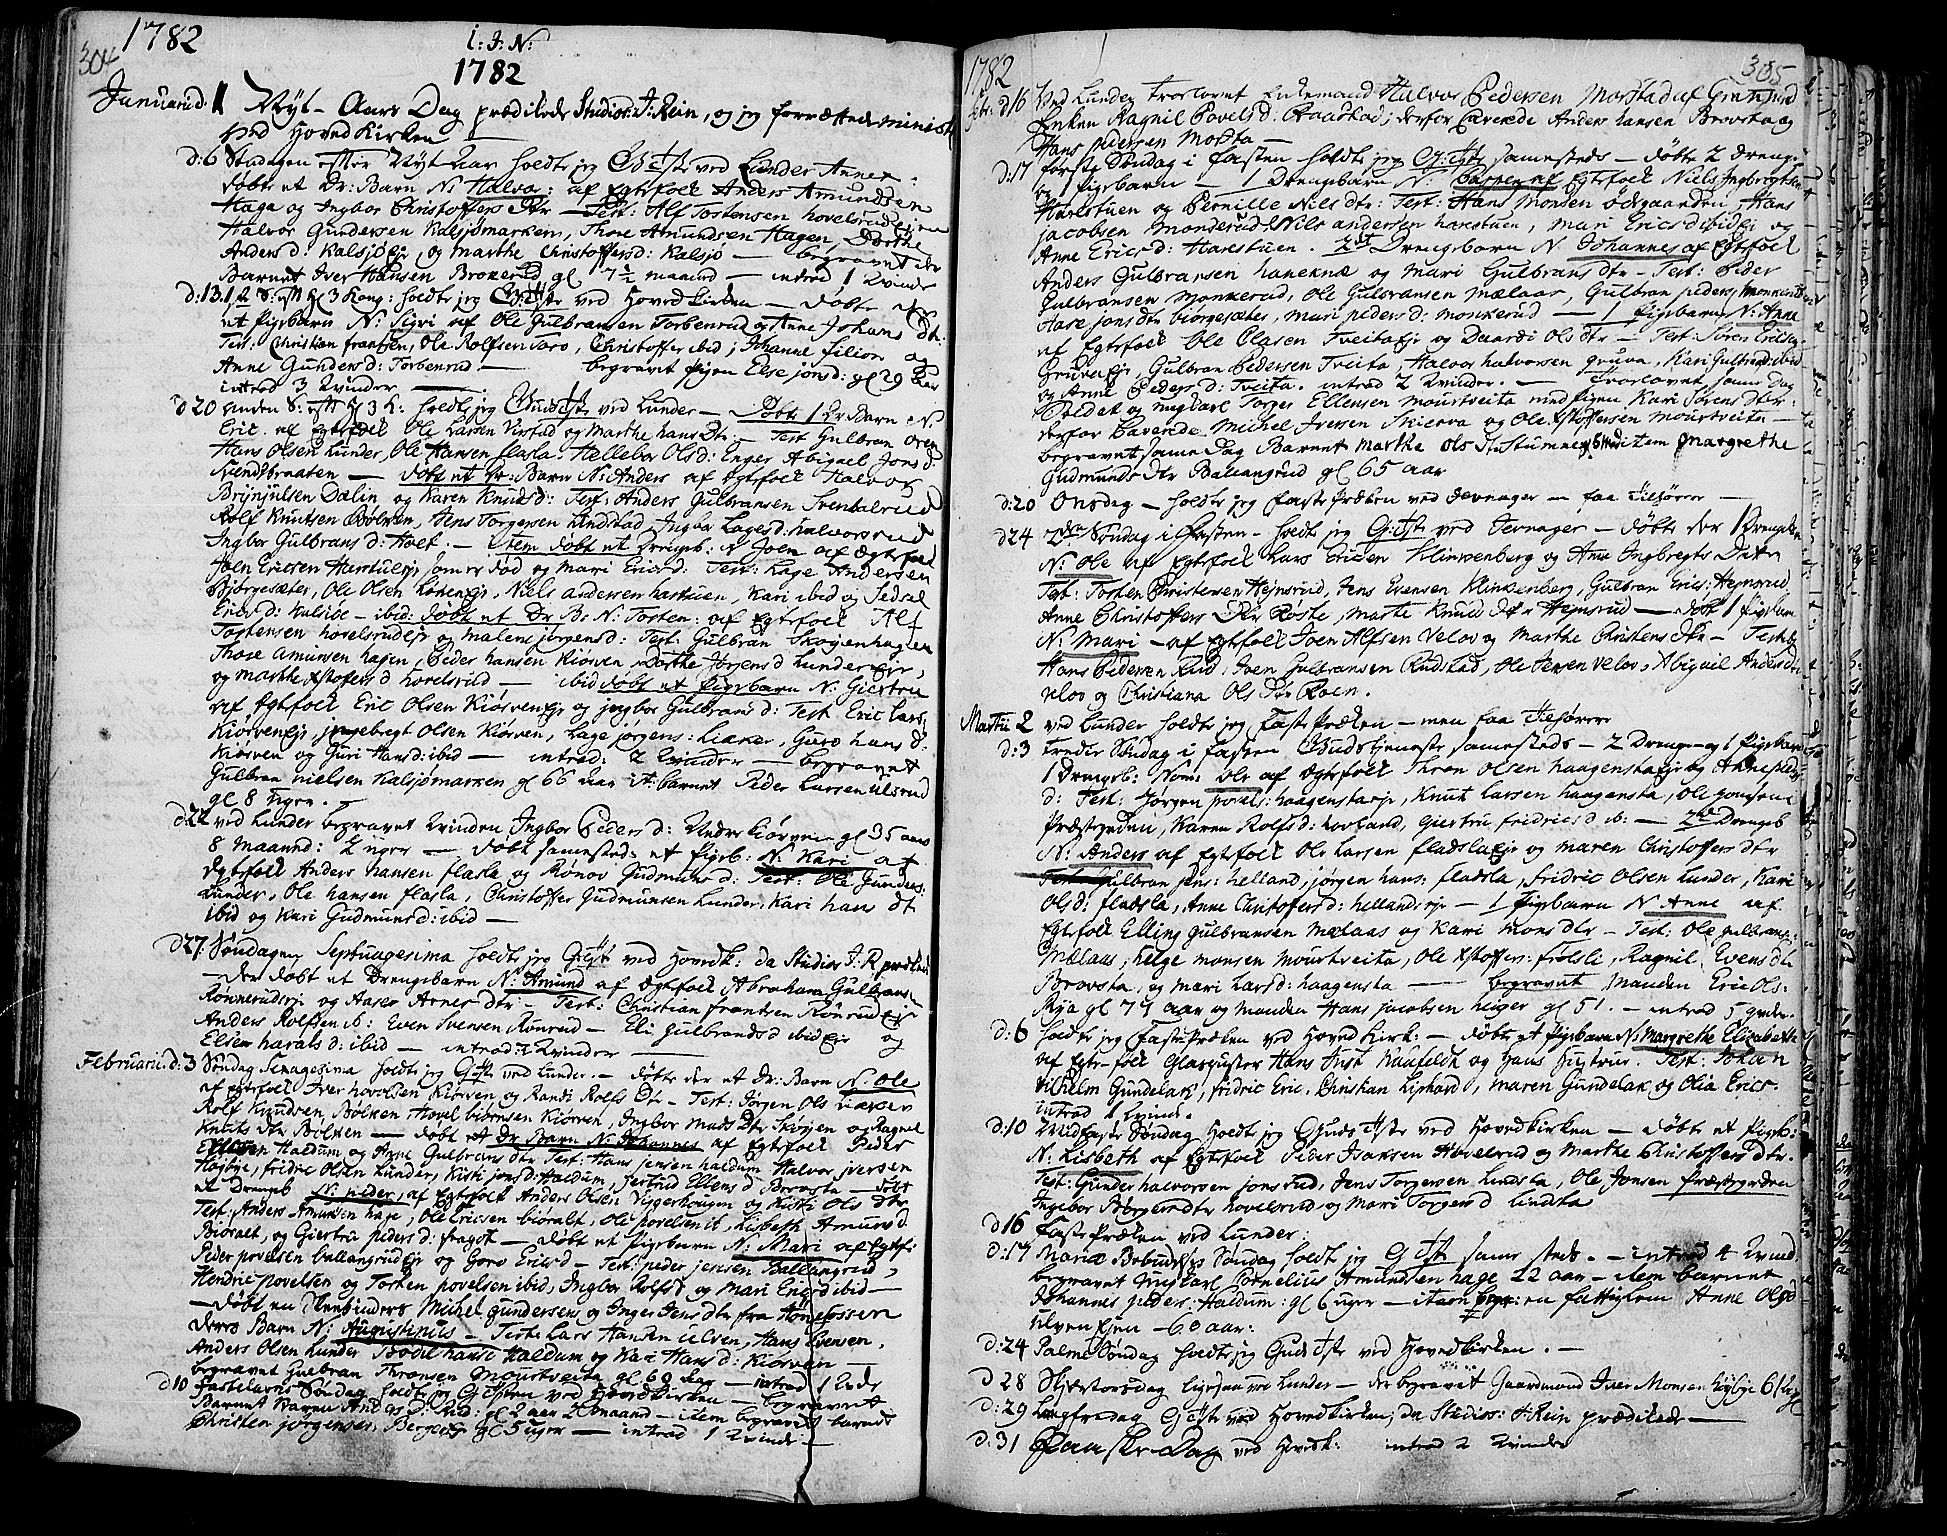 SAH, Jevnaker prestekontor, Ministerialbok nr. 3, 1752-1799, s. 304-305